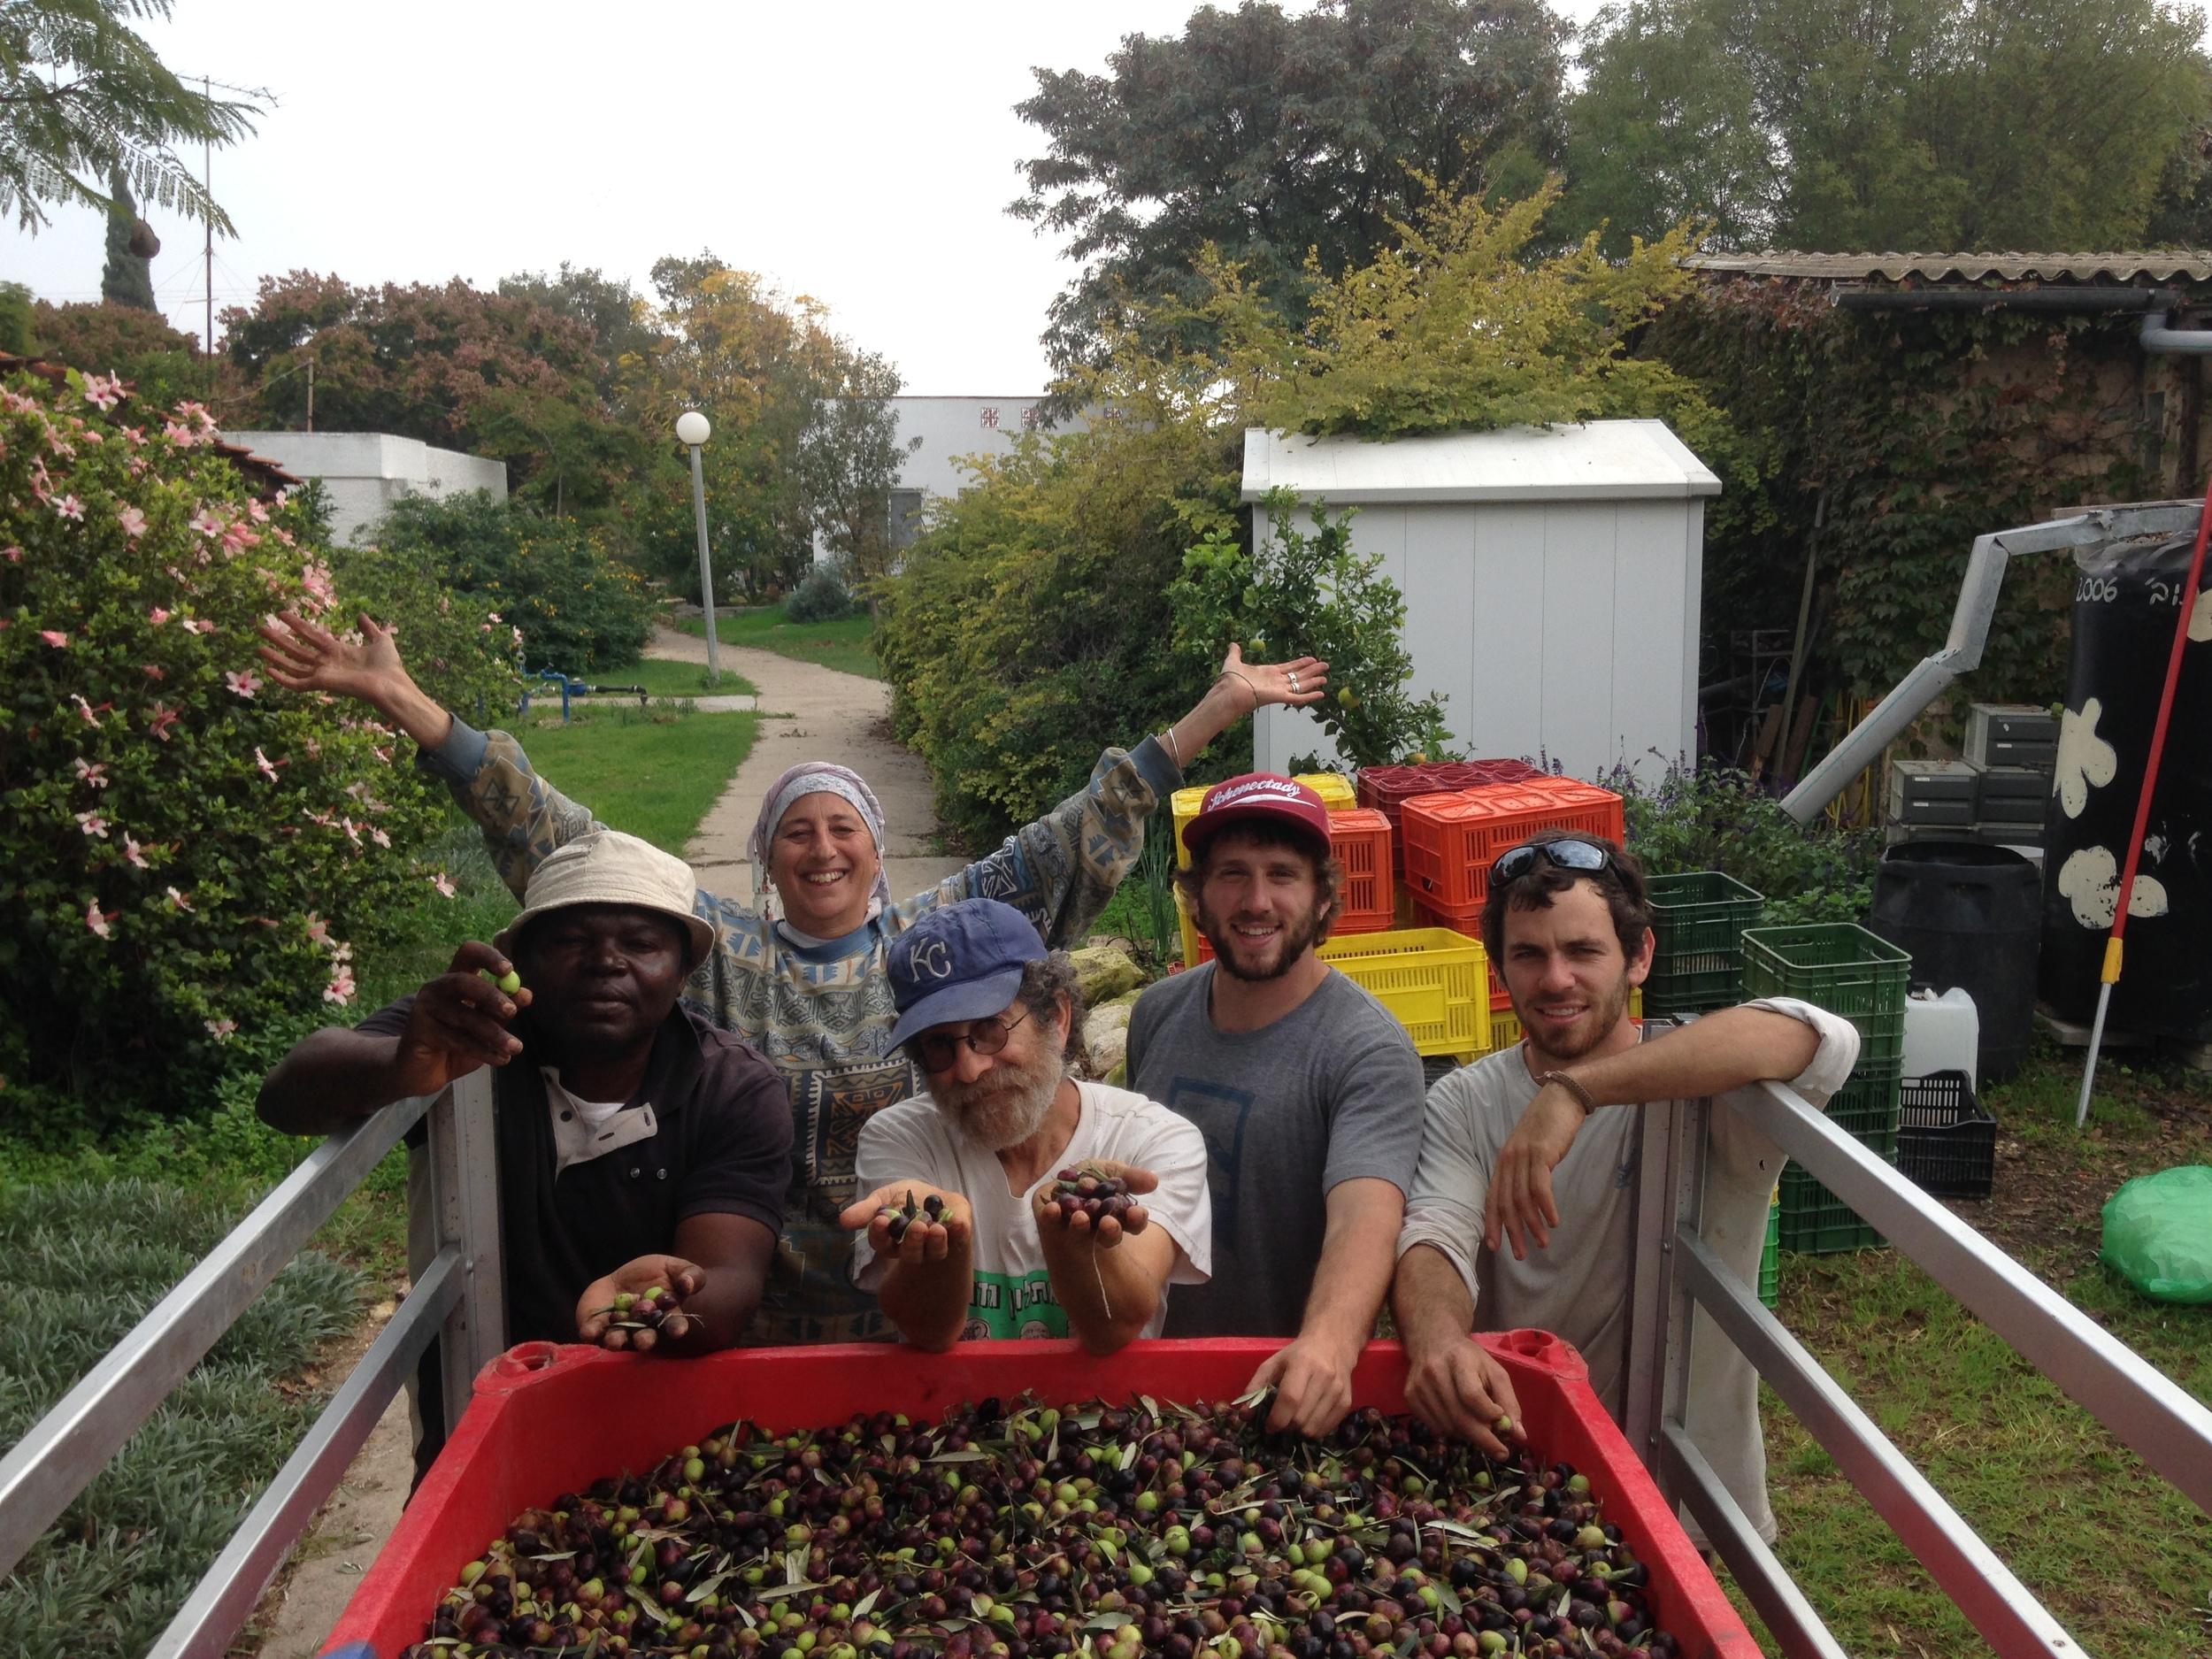 My work family on Kibbutz Gezer in Israel